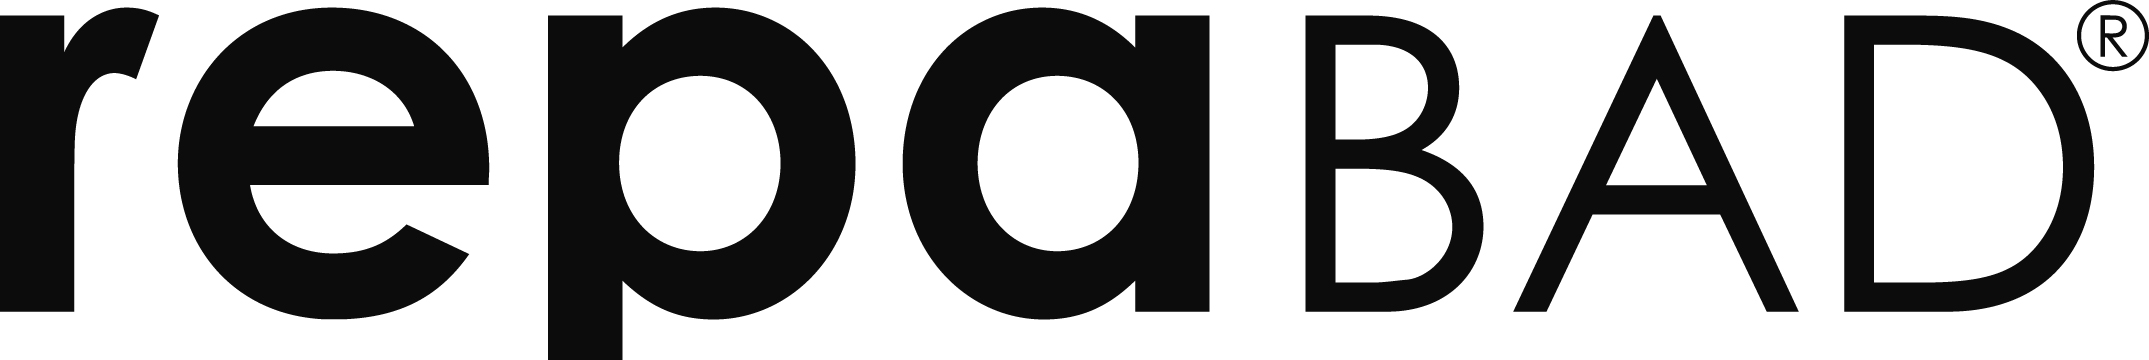 logo_sw_ohne.eps